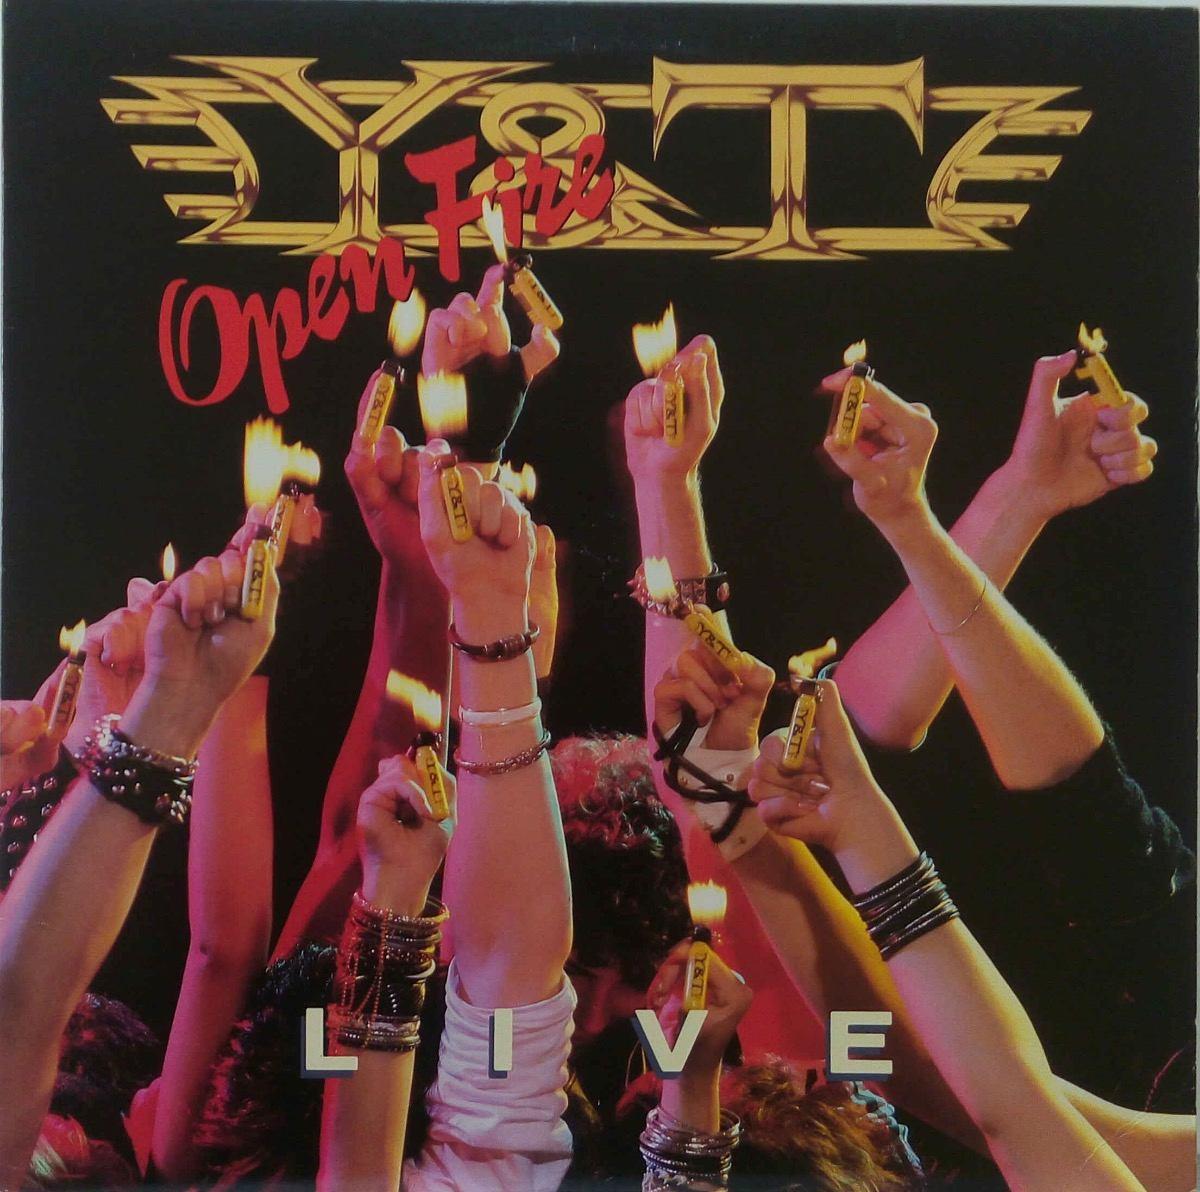 Top live albums  Yt-vinyl-americano-open-fire-live-de-1985-hrd-hvy-vrx-vnl-D_NQ_NP_950511-MLM25778100059_072017-F